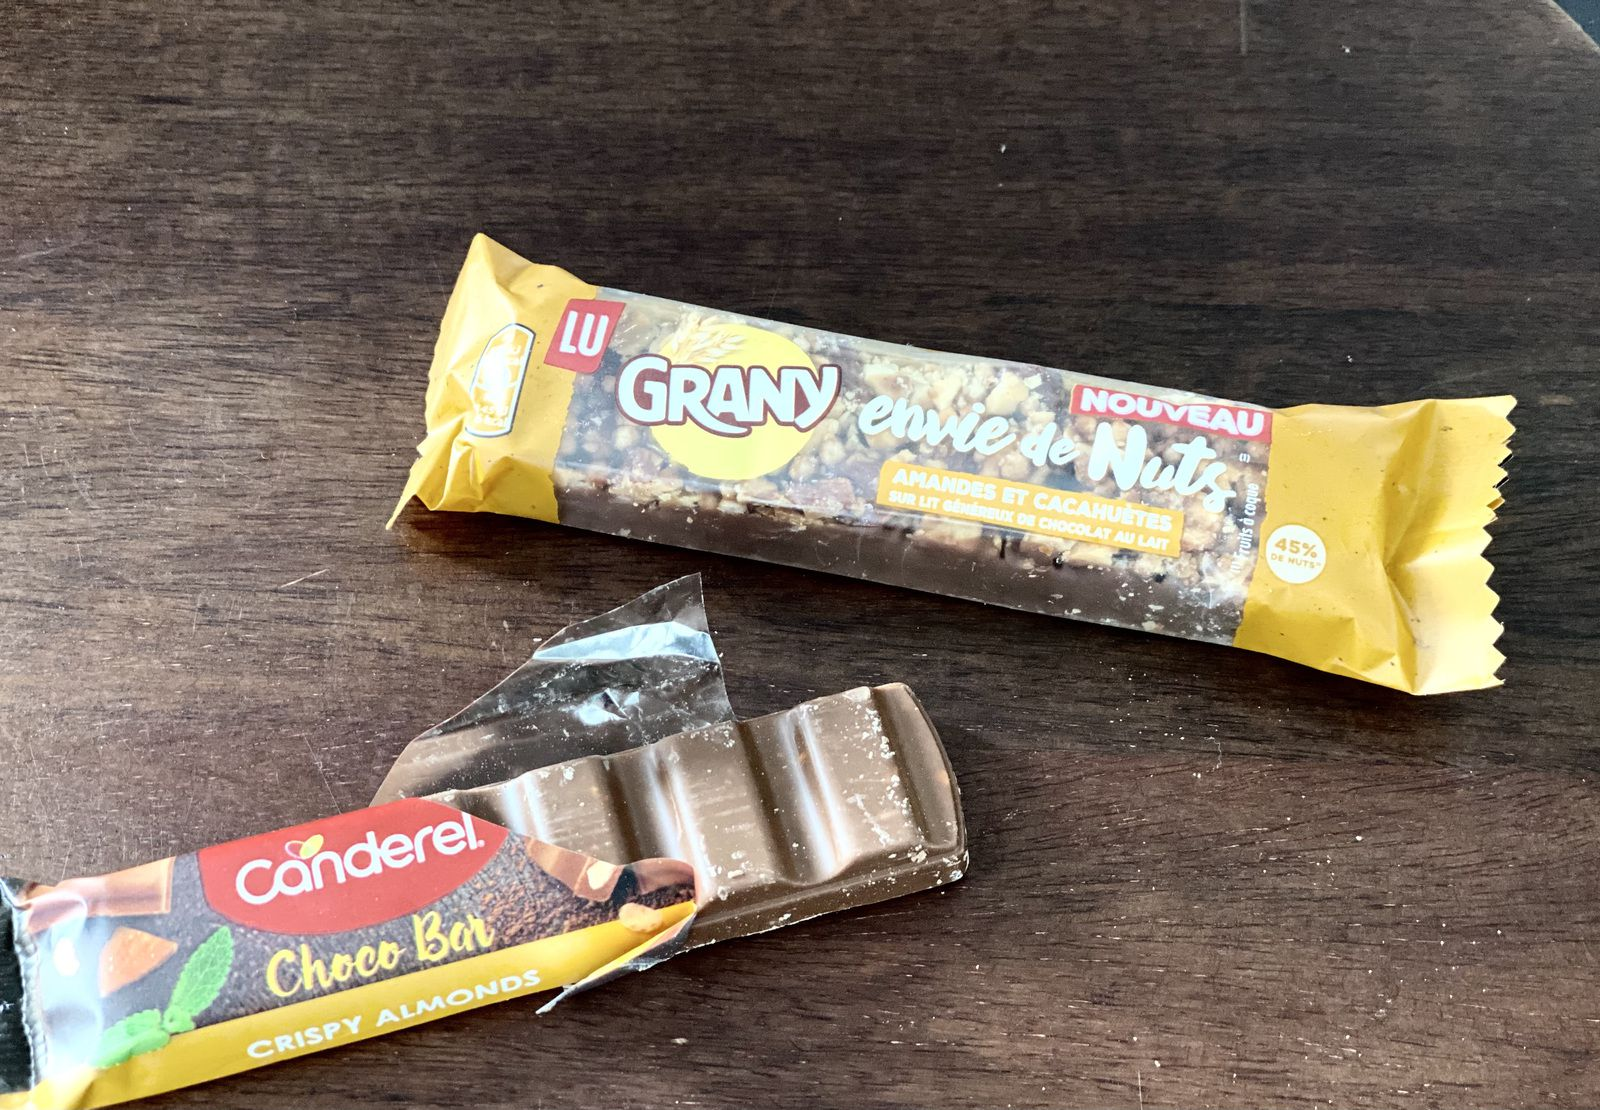 Chocolat show